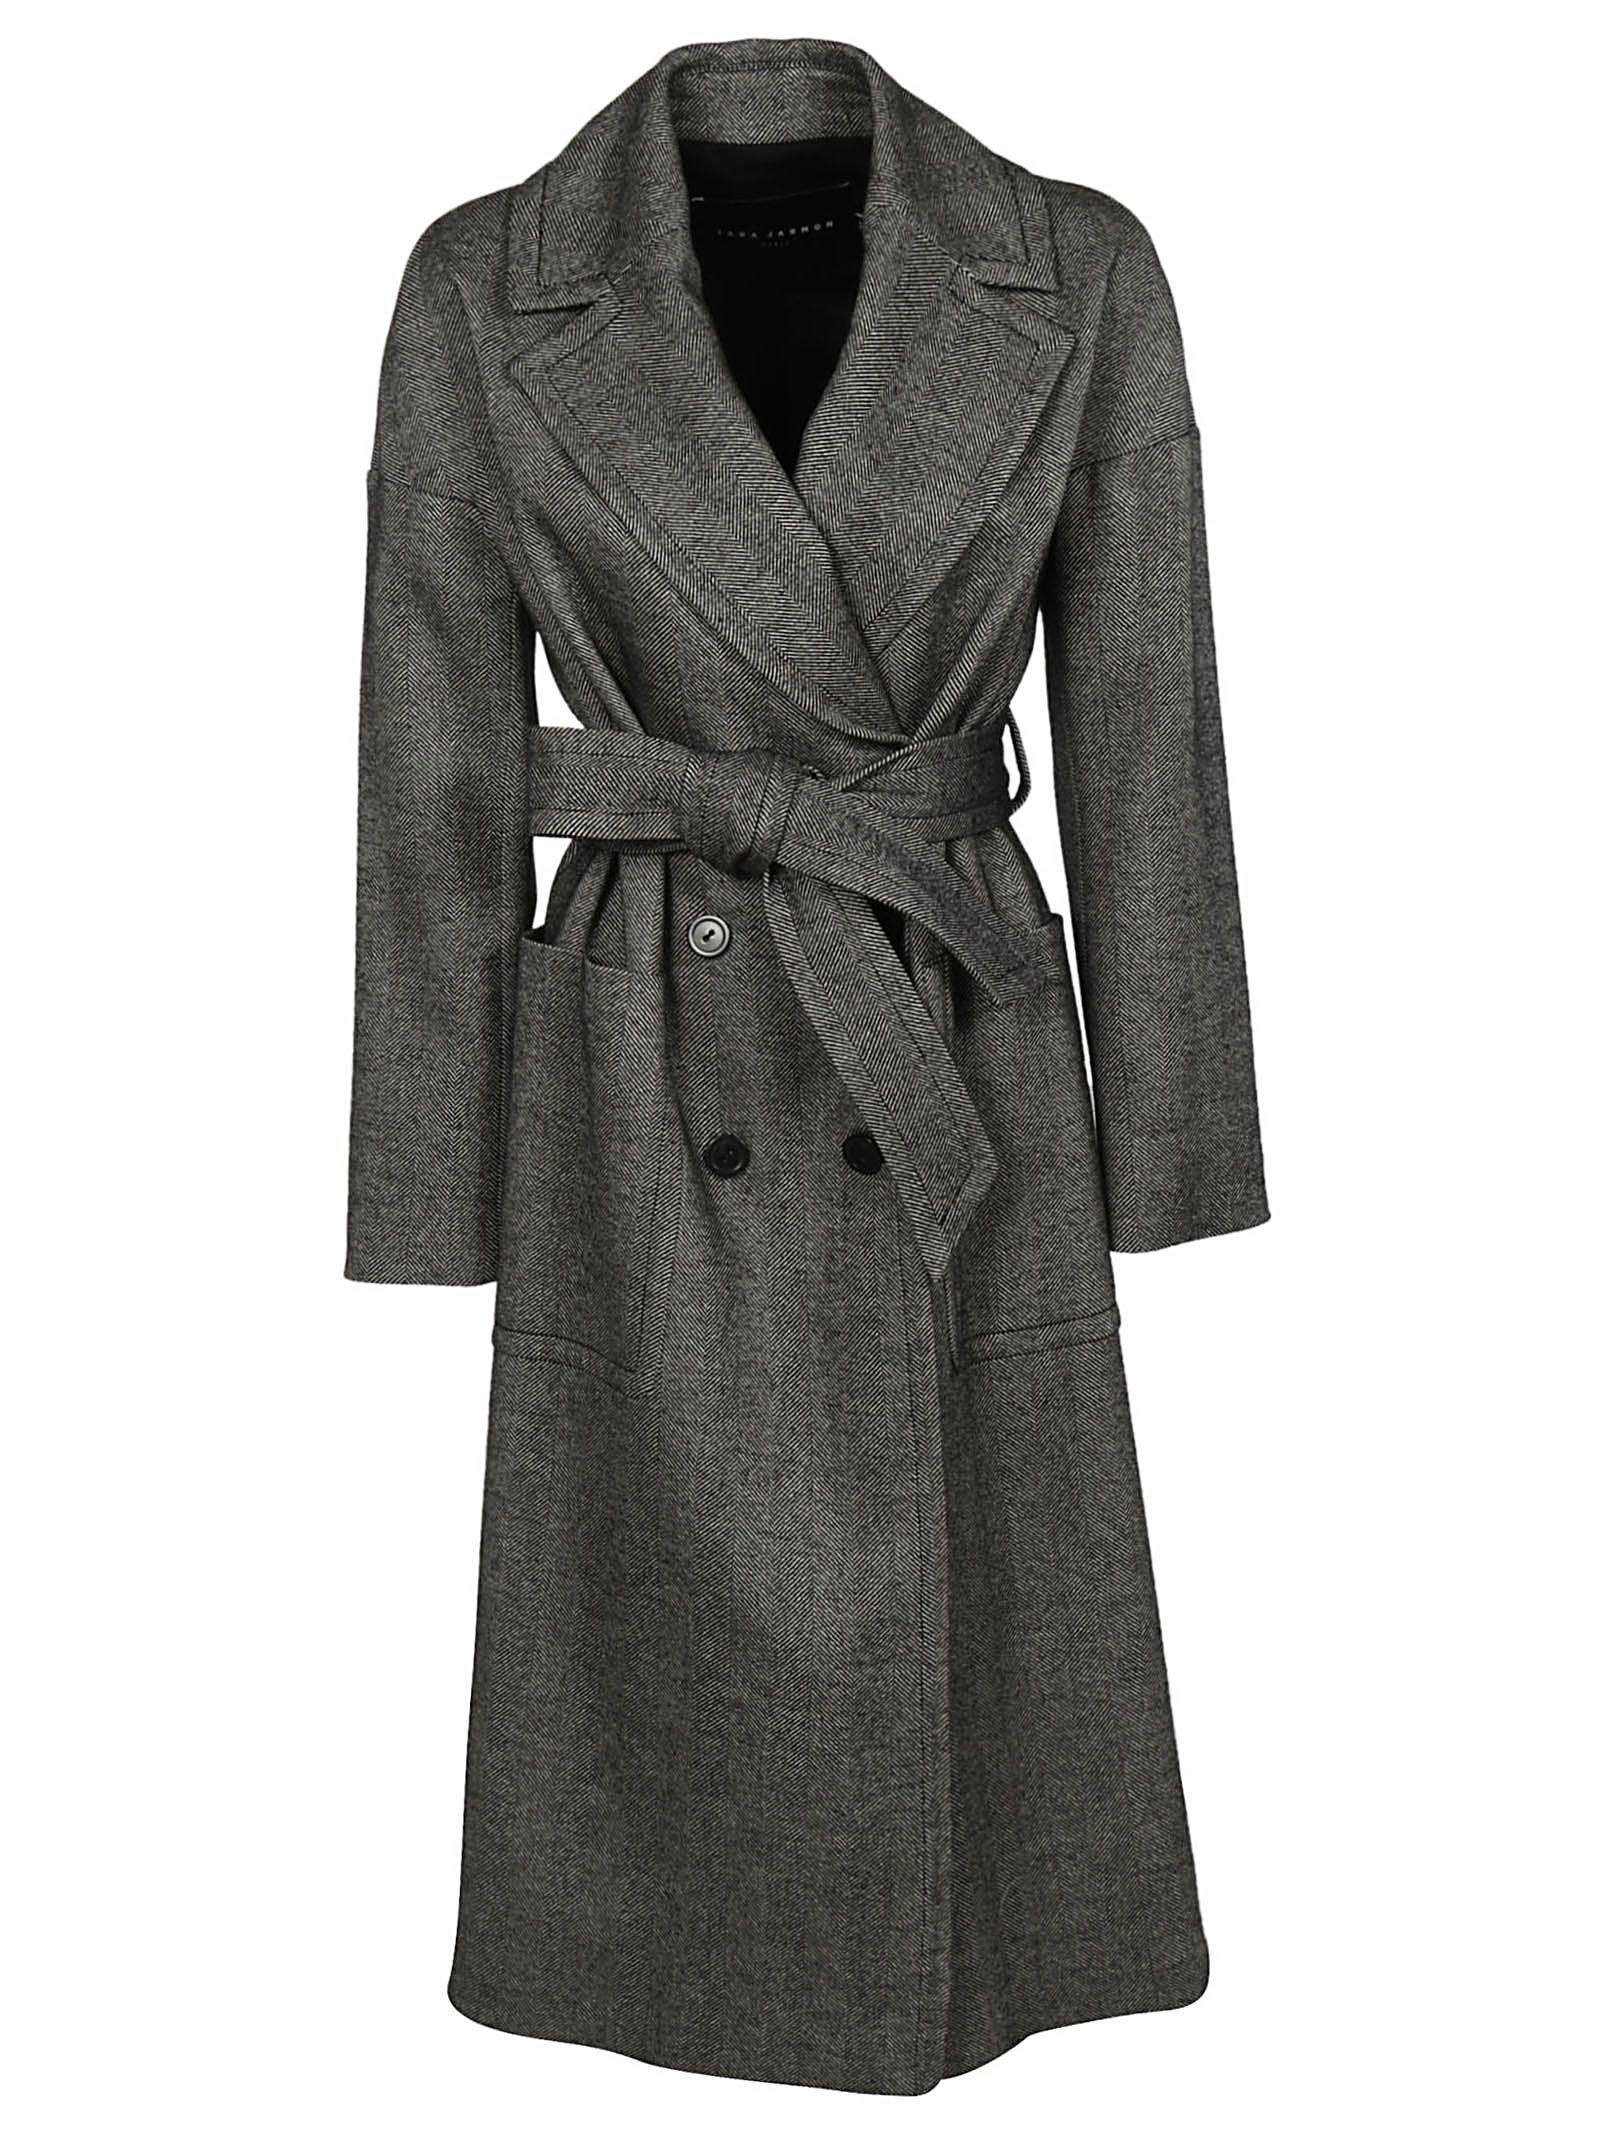 TARA JARMON Herringbone Trench Coat in Noir